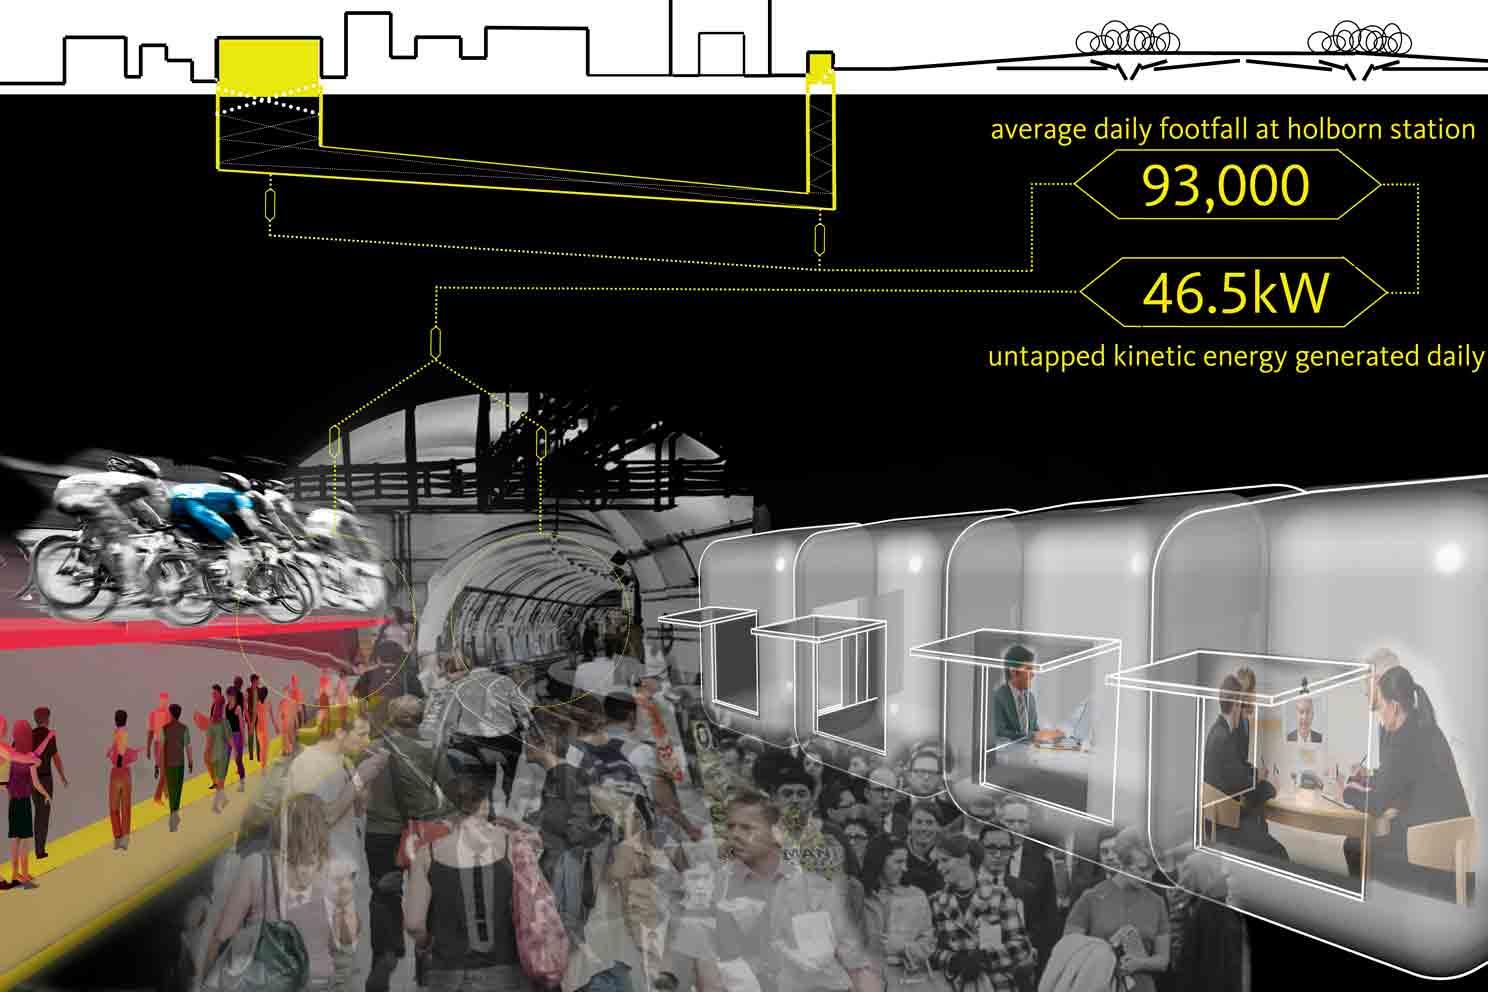 The-London-Underline-1 website